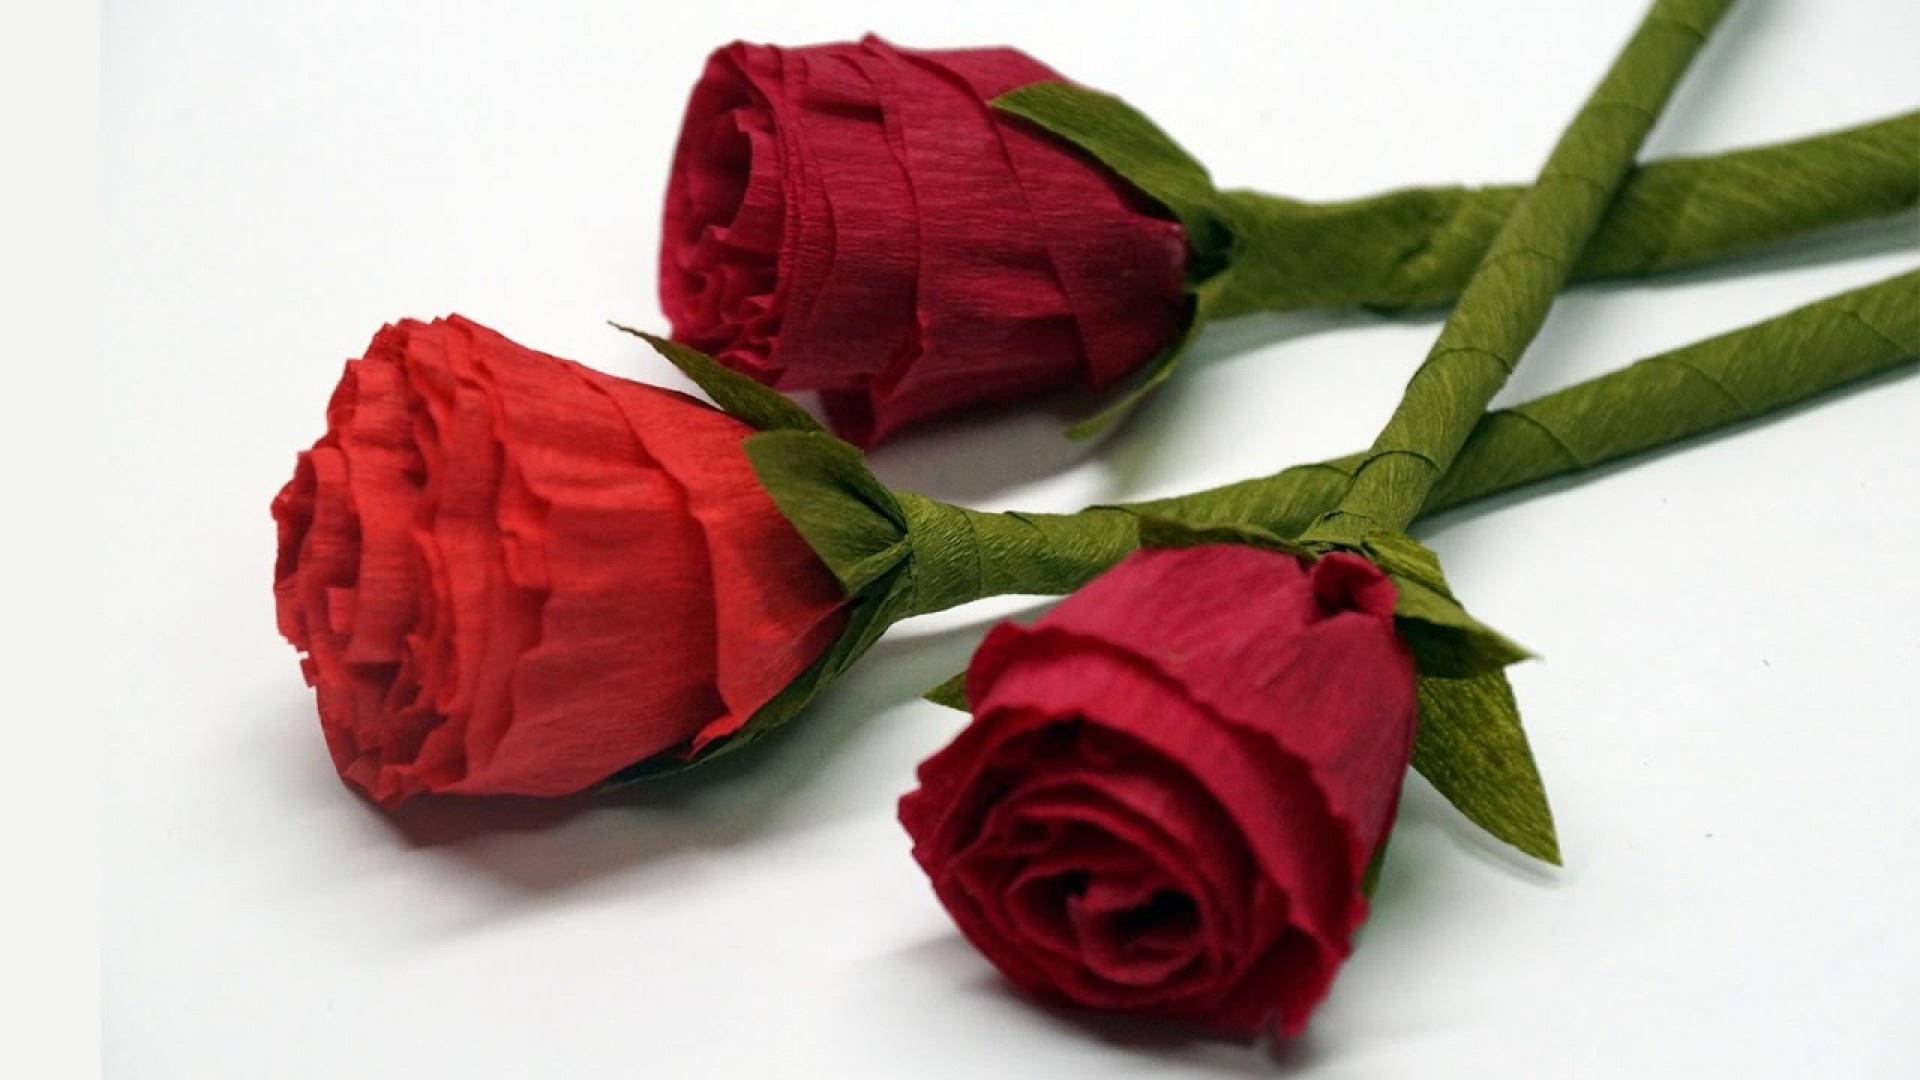 012 Maxresdefault About Rose Flower Essay Unbelievable In Marathi Kannada Language 1920